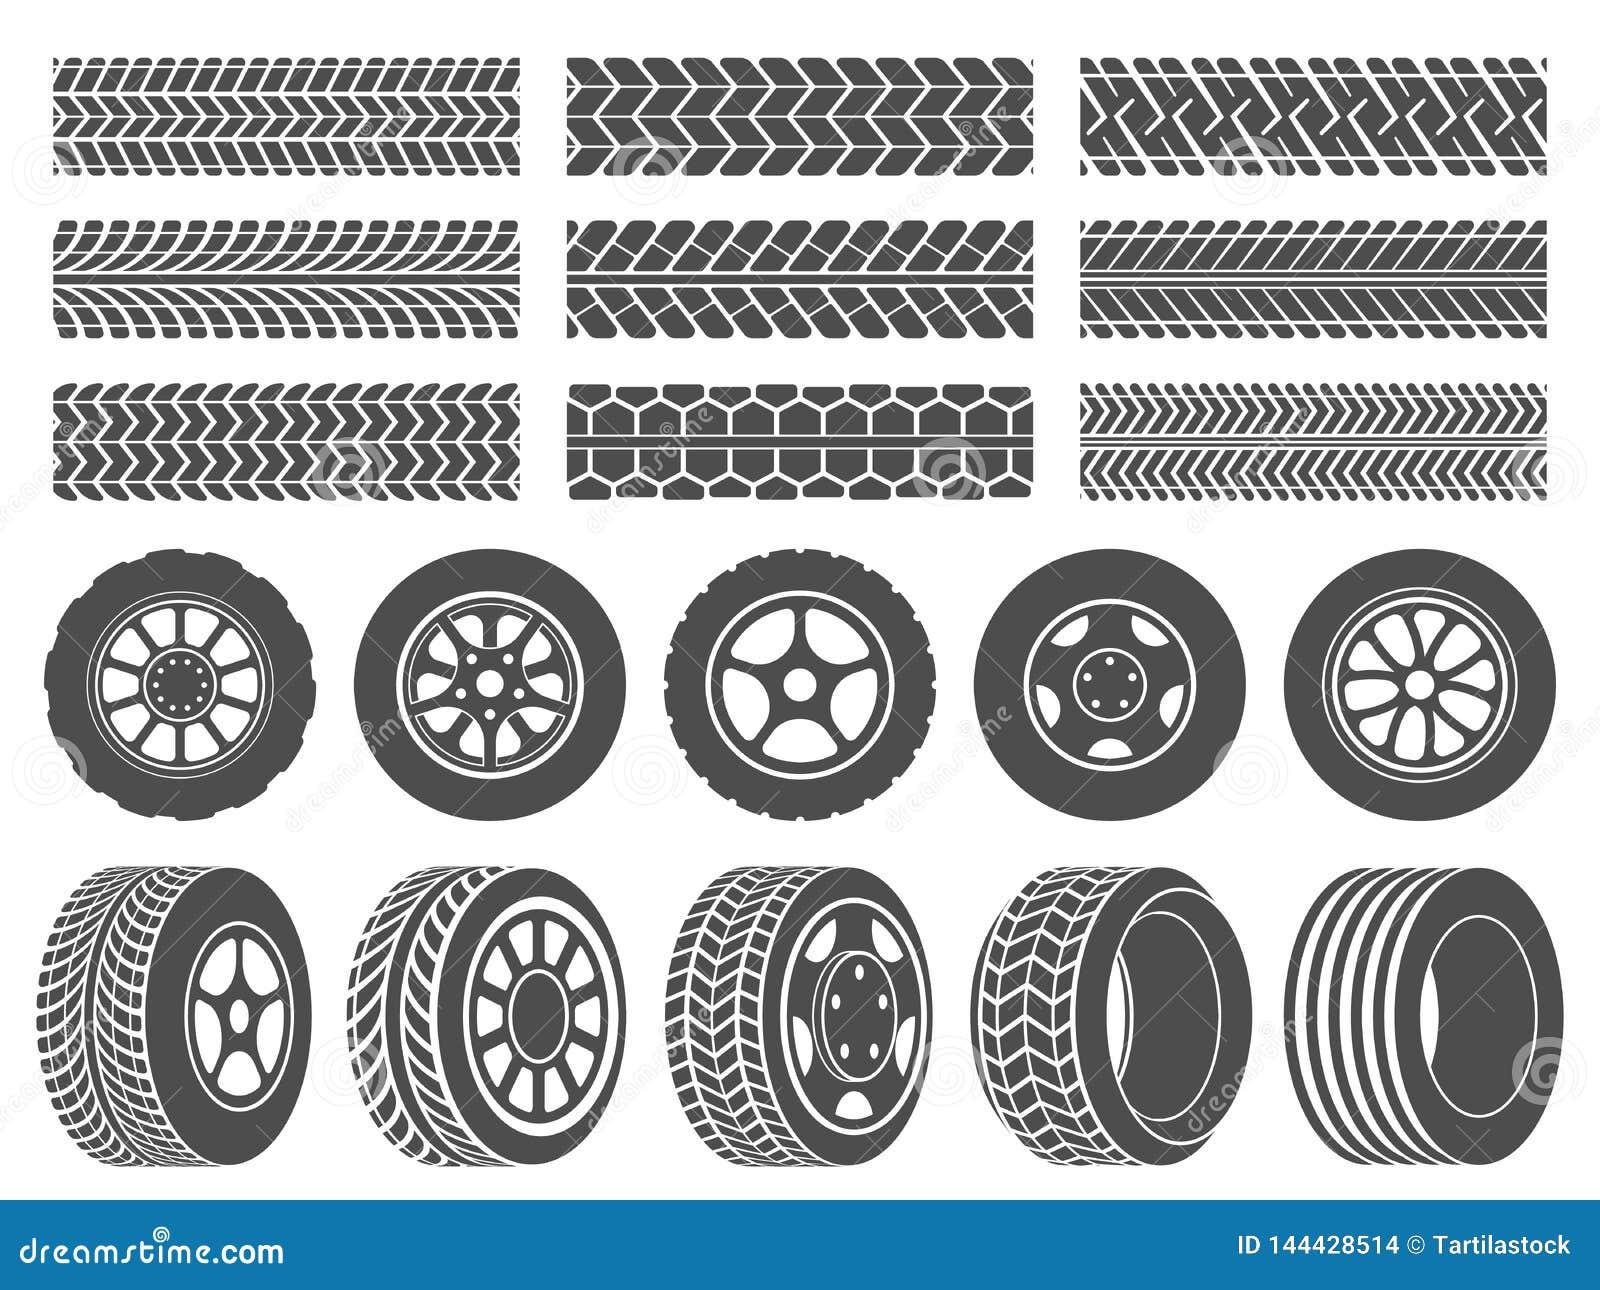 Wheel Tires Car Tire Tread Tracks Motorcycle Racing Wheels Icons